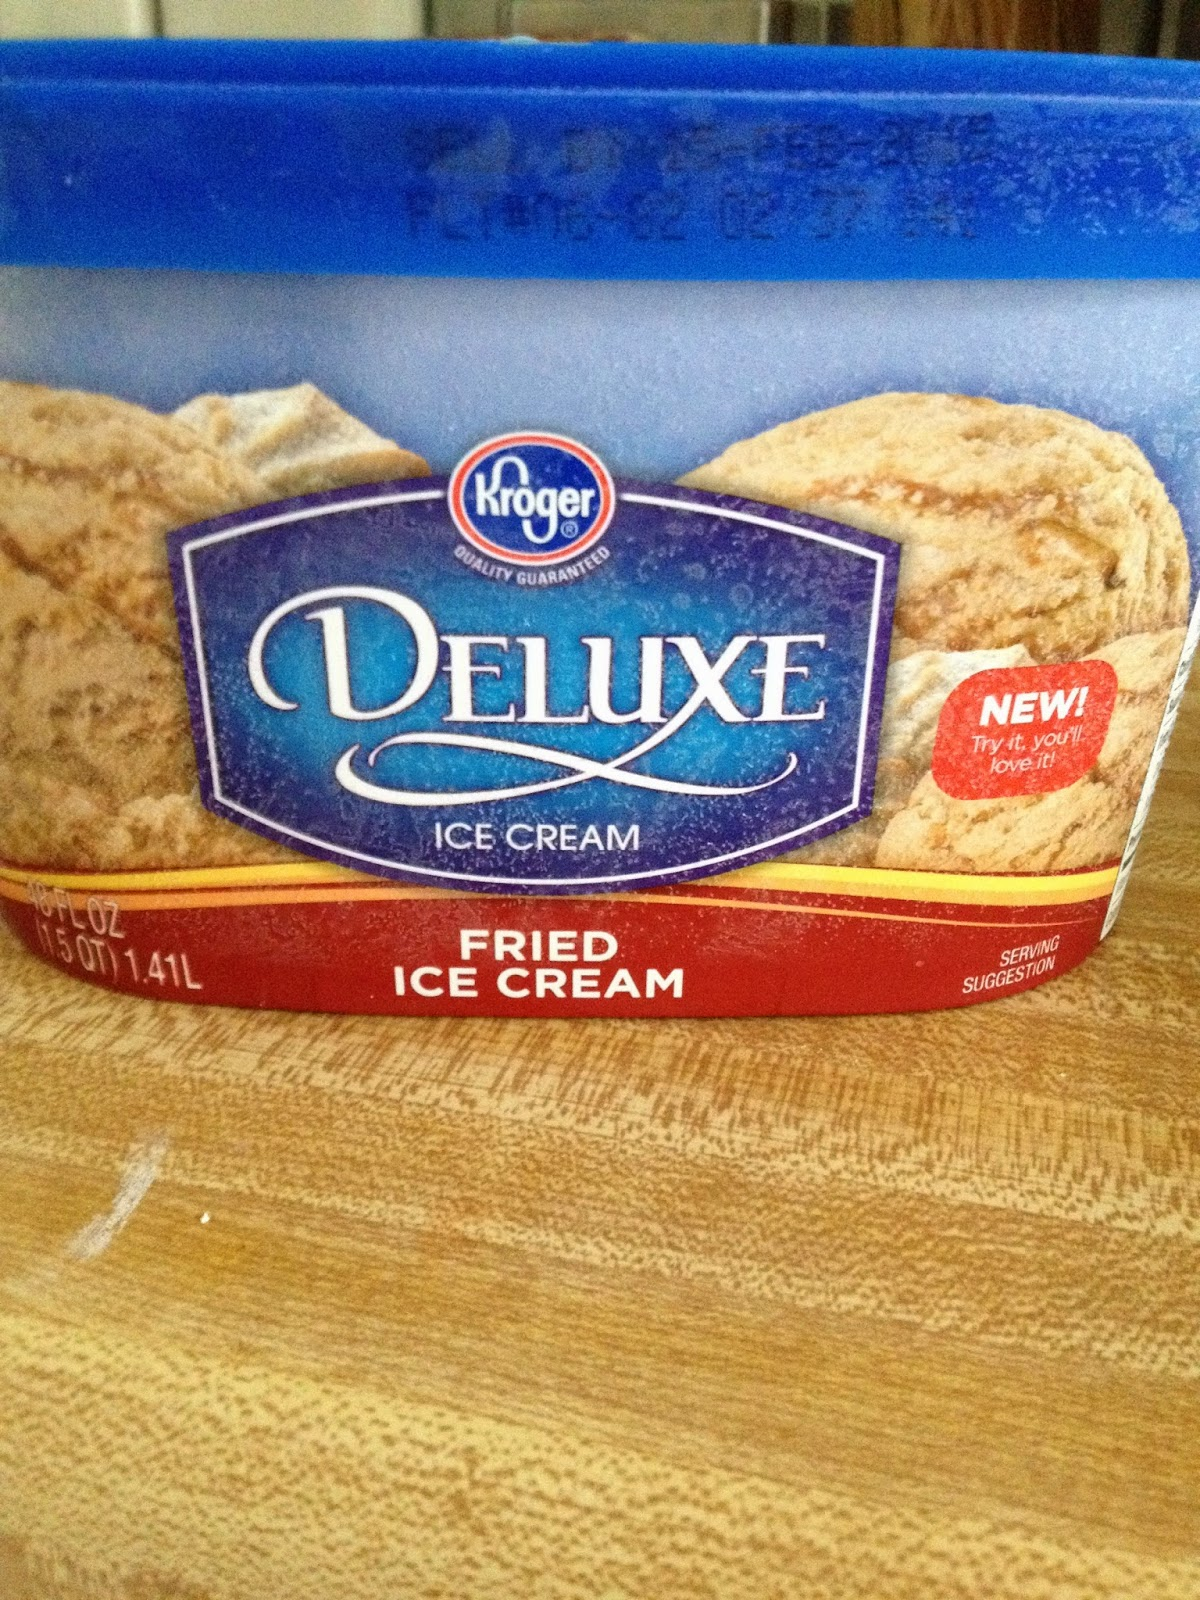 Kroger Delux Fried Ice Cream